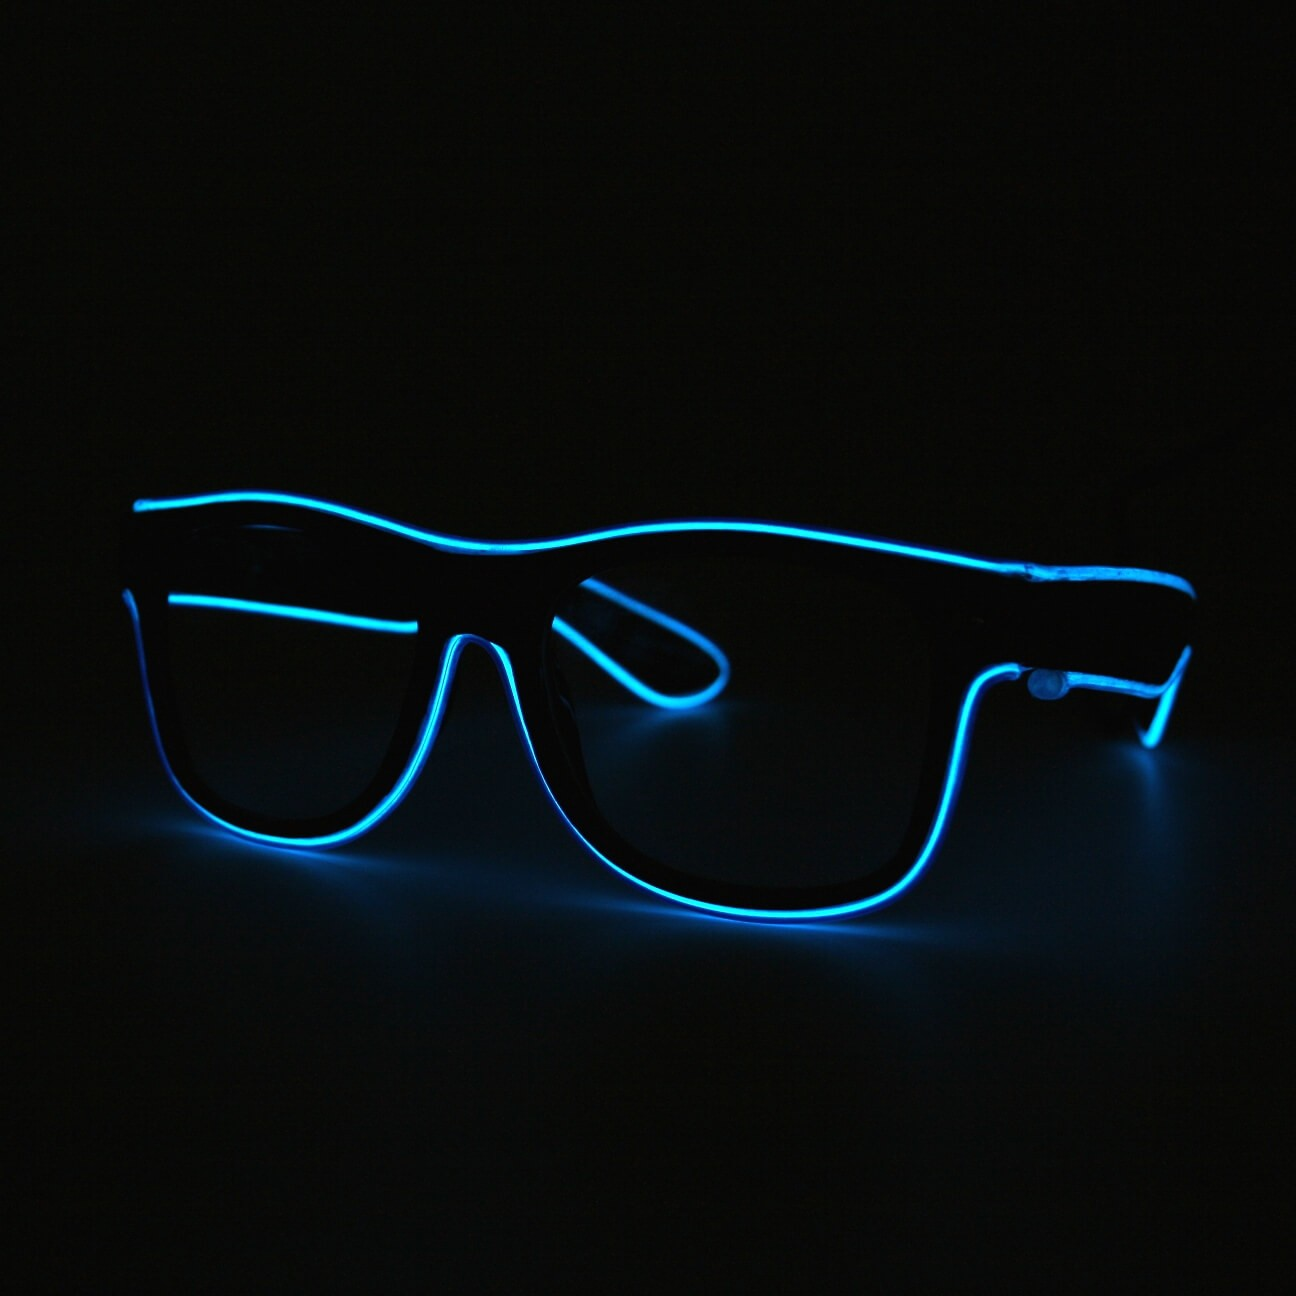 LED Neon Glasses Blue Transparent Glasses